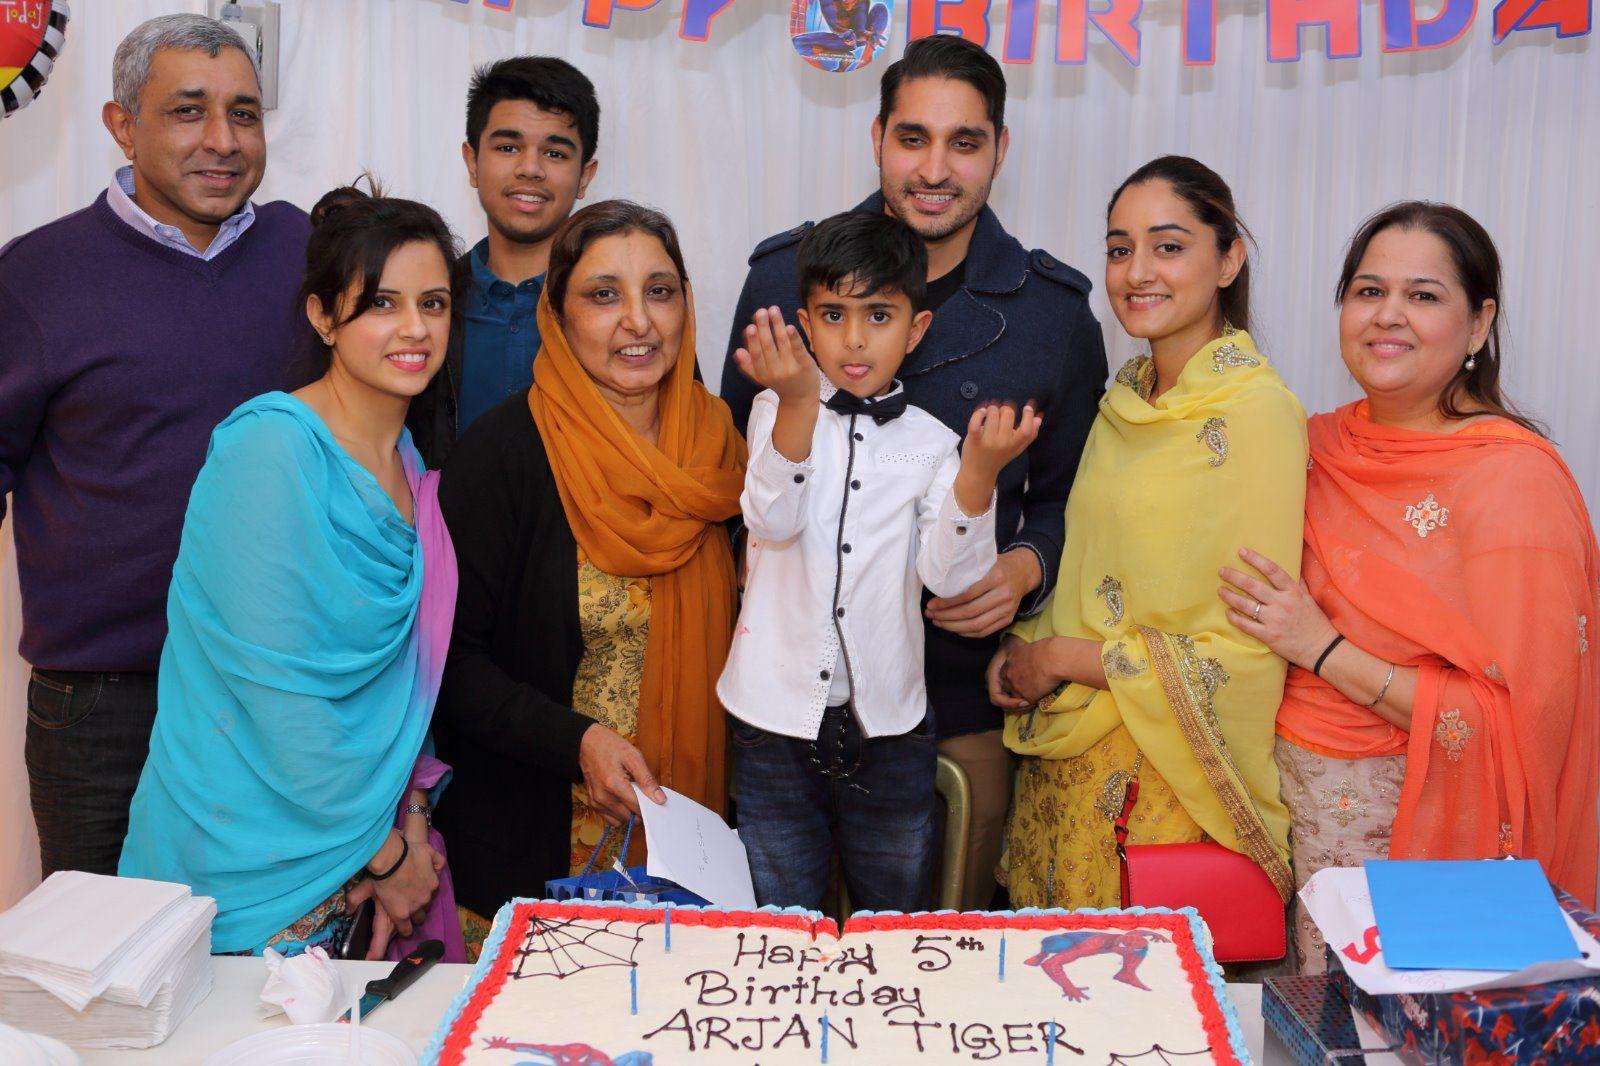 Party Arjun's 5th Birthday